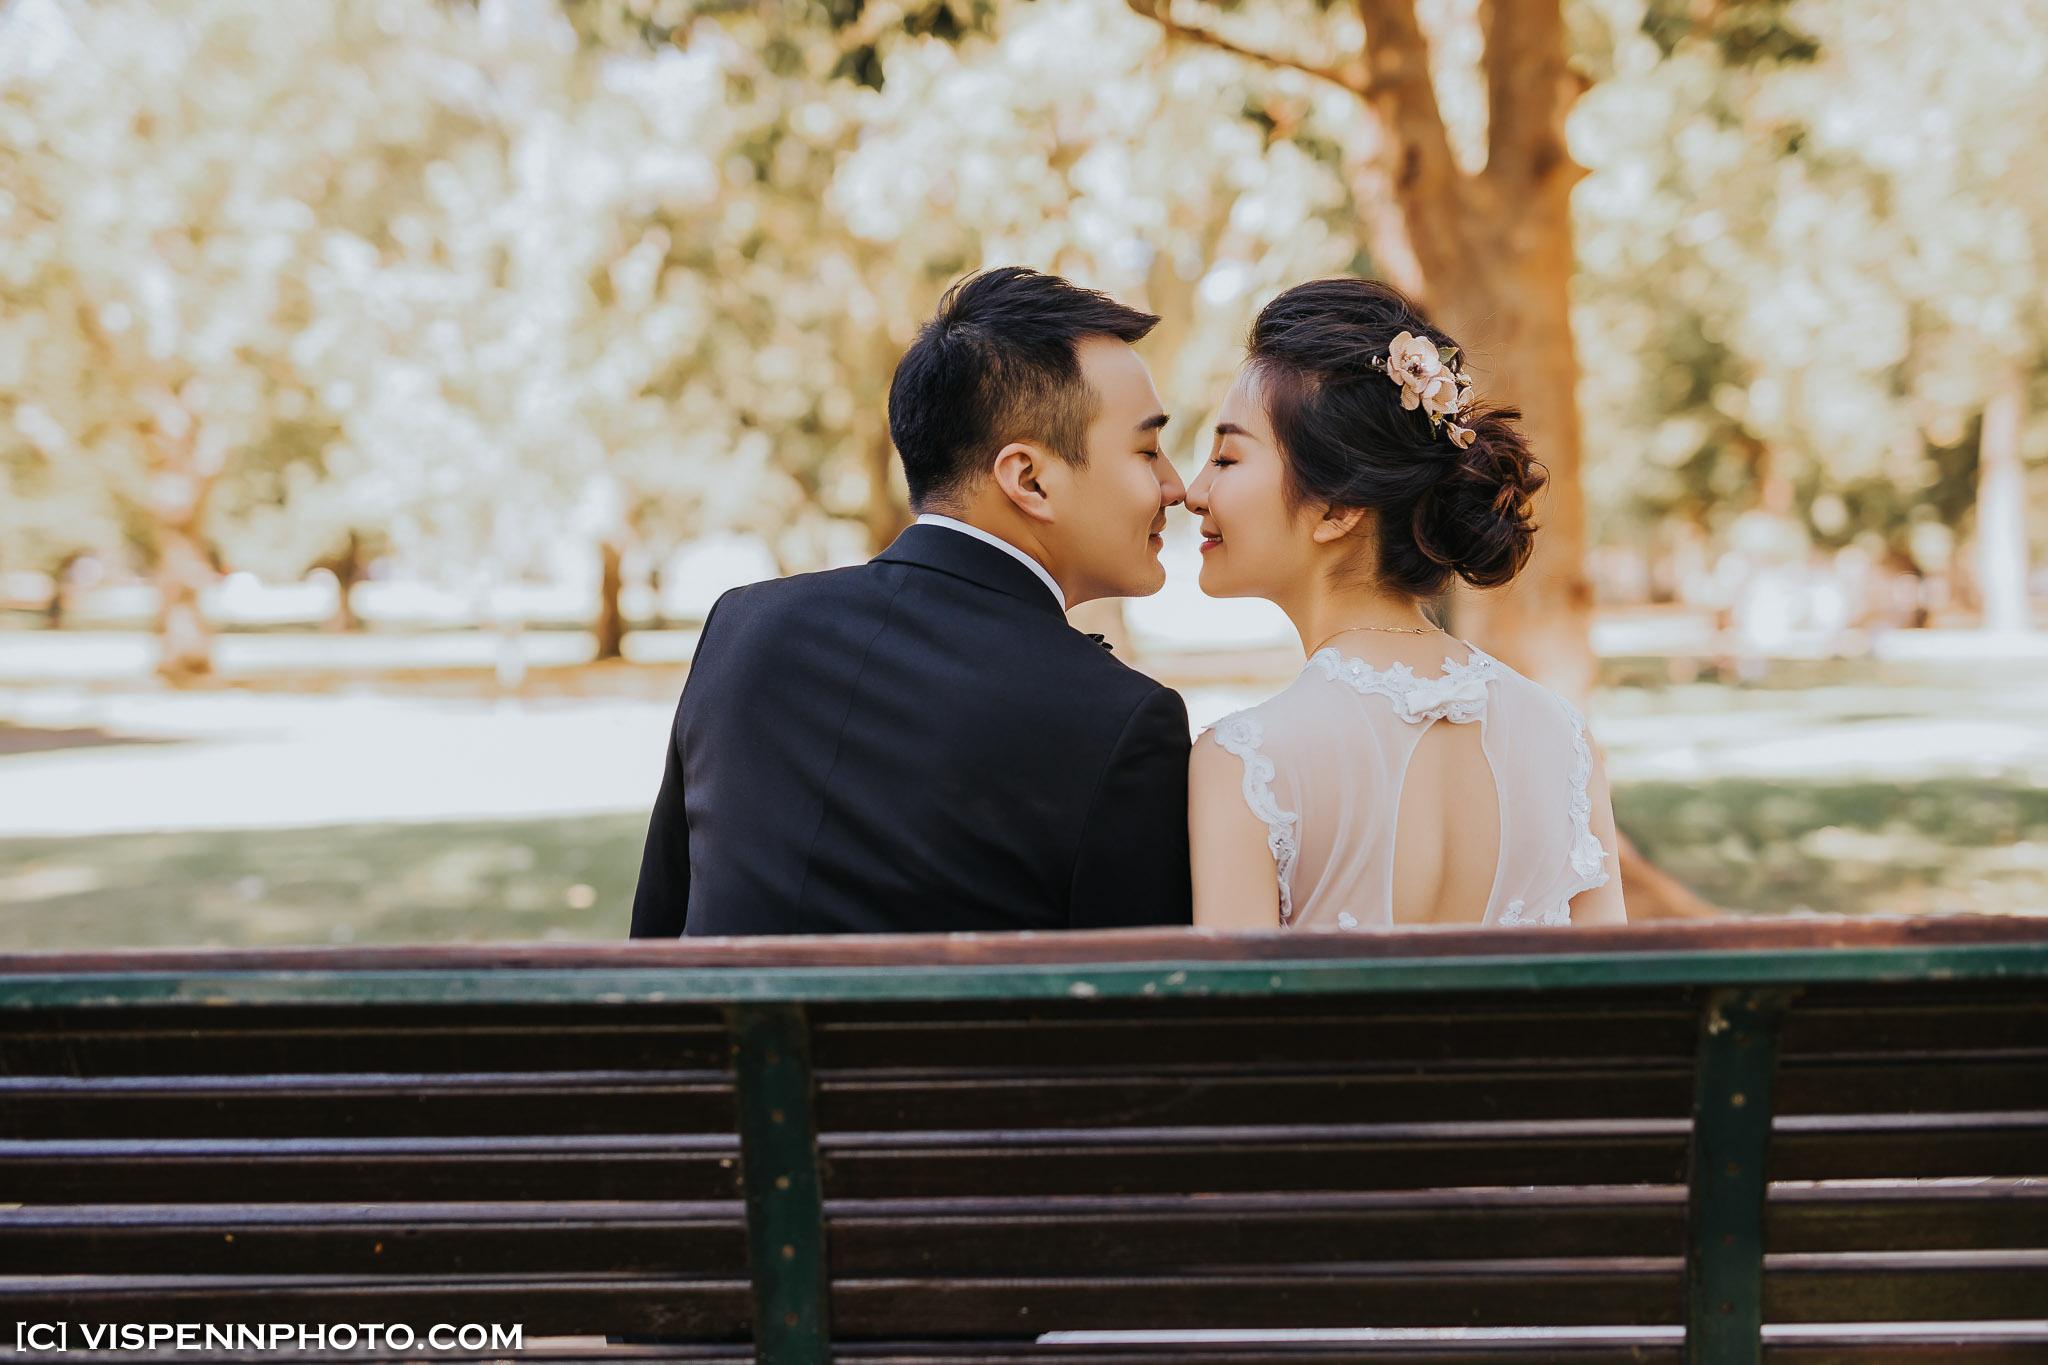 PRE WEDDING Photography Melbourne VISPENN 墨尔本 婚纱照 结婚照 婚纱摄影 5D5 8399